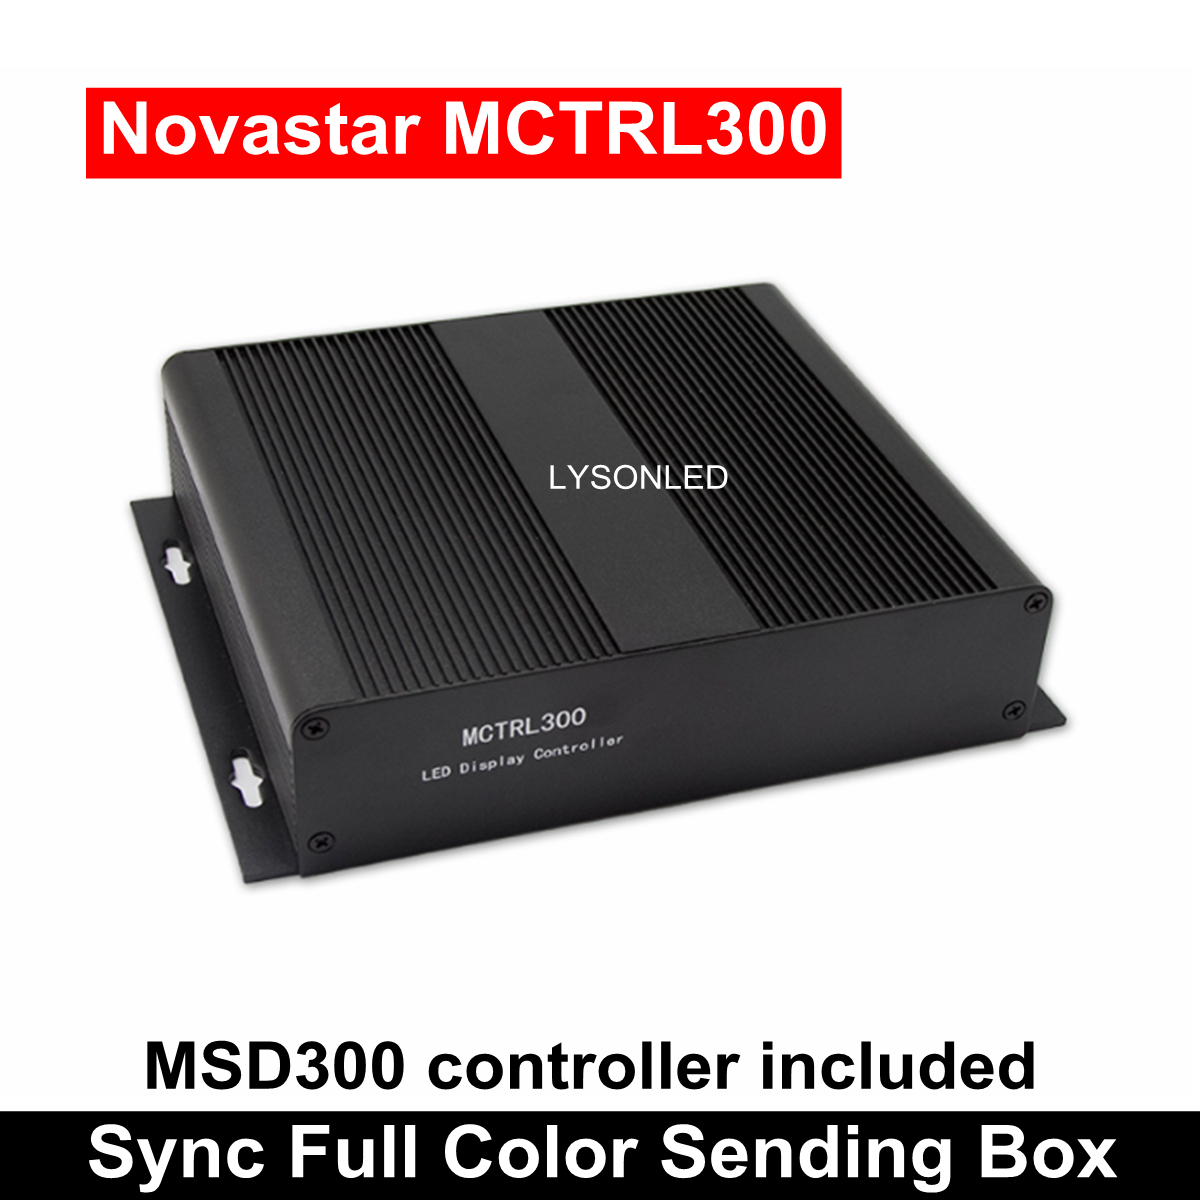 NovaStar MCTRL300 Controller Full Color LED Display Sending Box With MSD300 Mother Card Inside